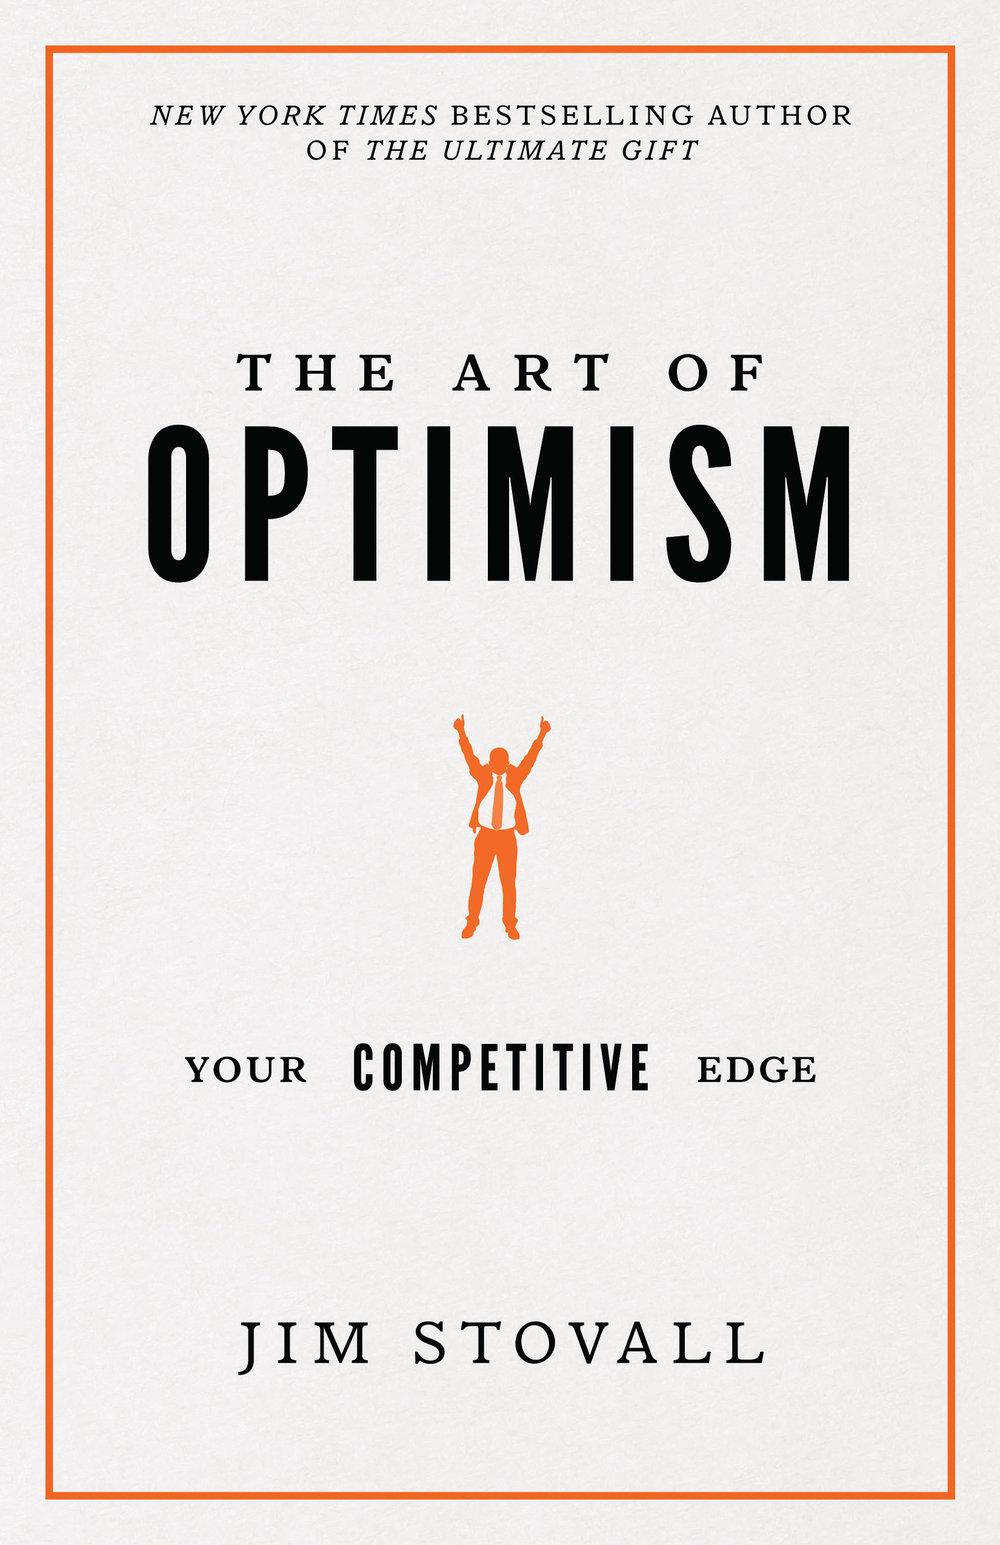 The_Art_of_Optimism.jpg